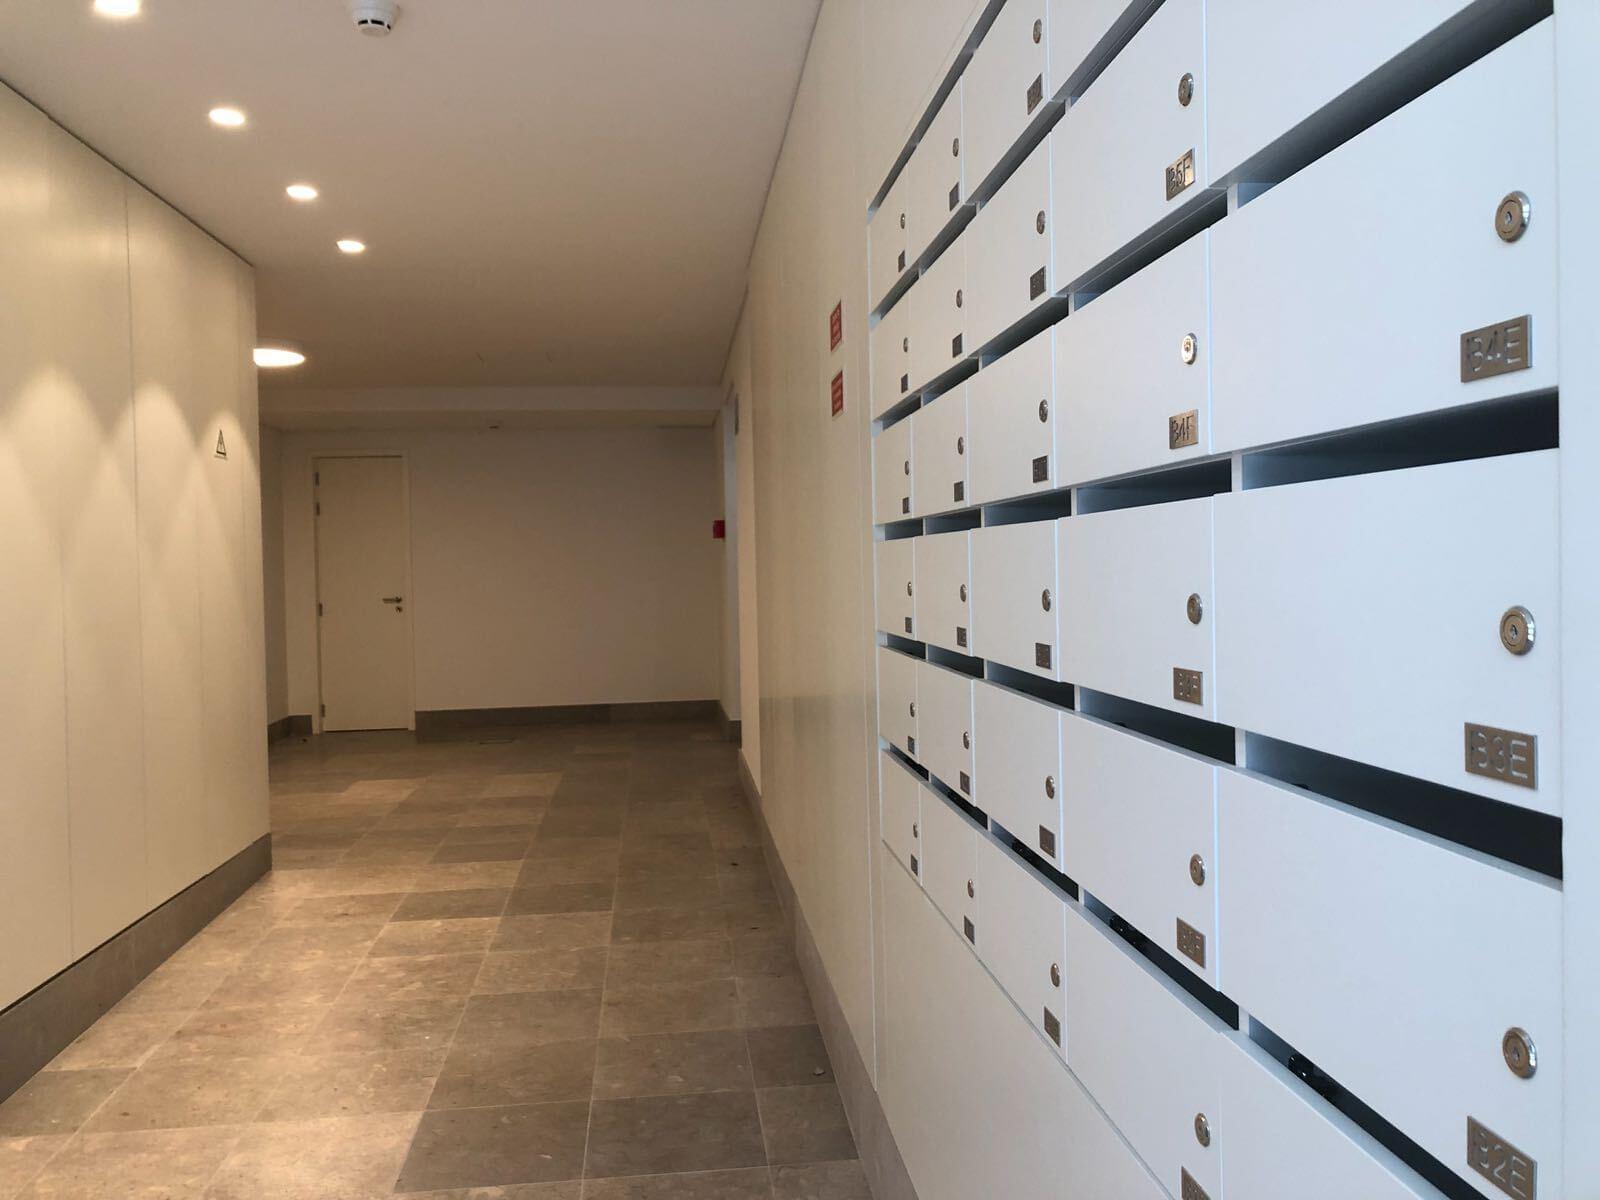 pf17142-apartamento-t2-lisboa-3324517c-7f07-4e1b-ade2-4a16a68d5e76